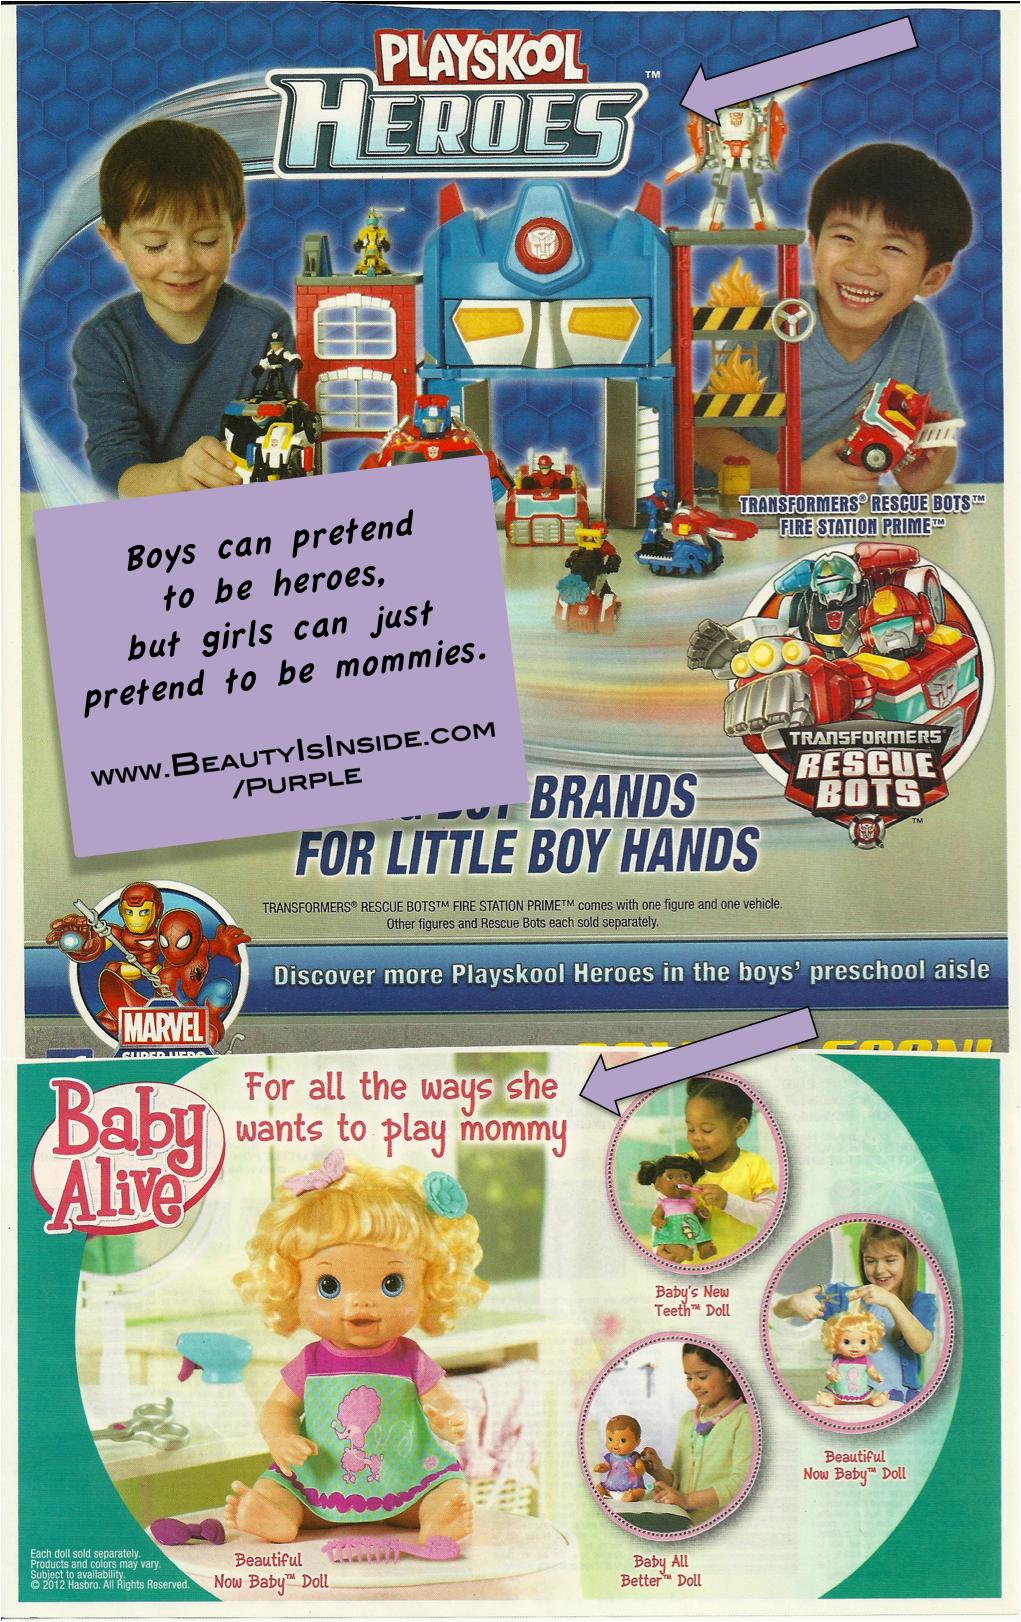 Playskool & Hasbro